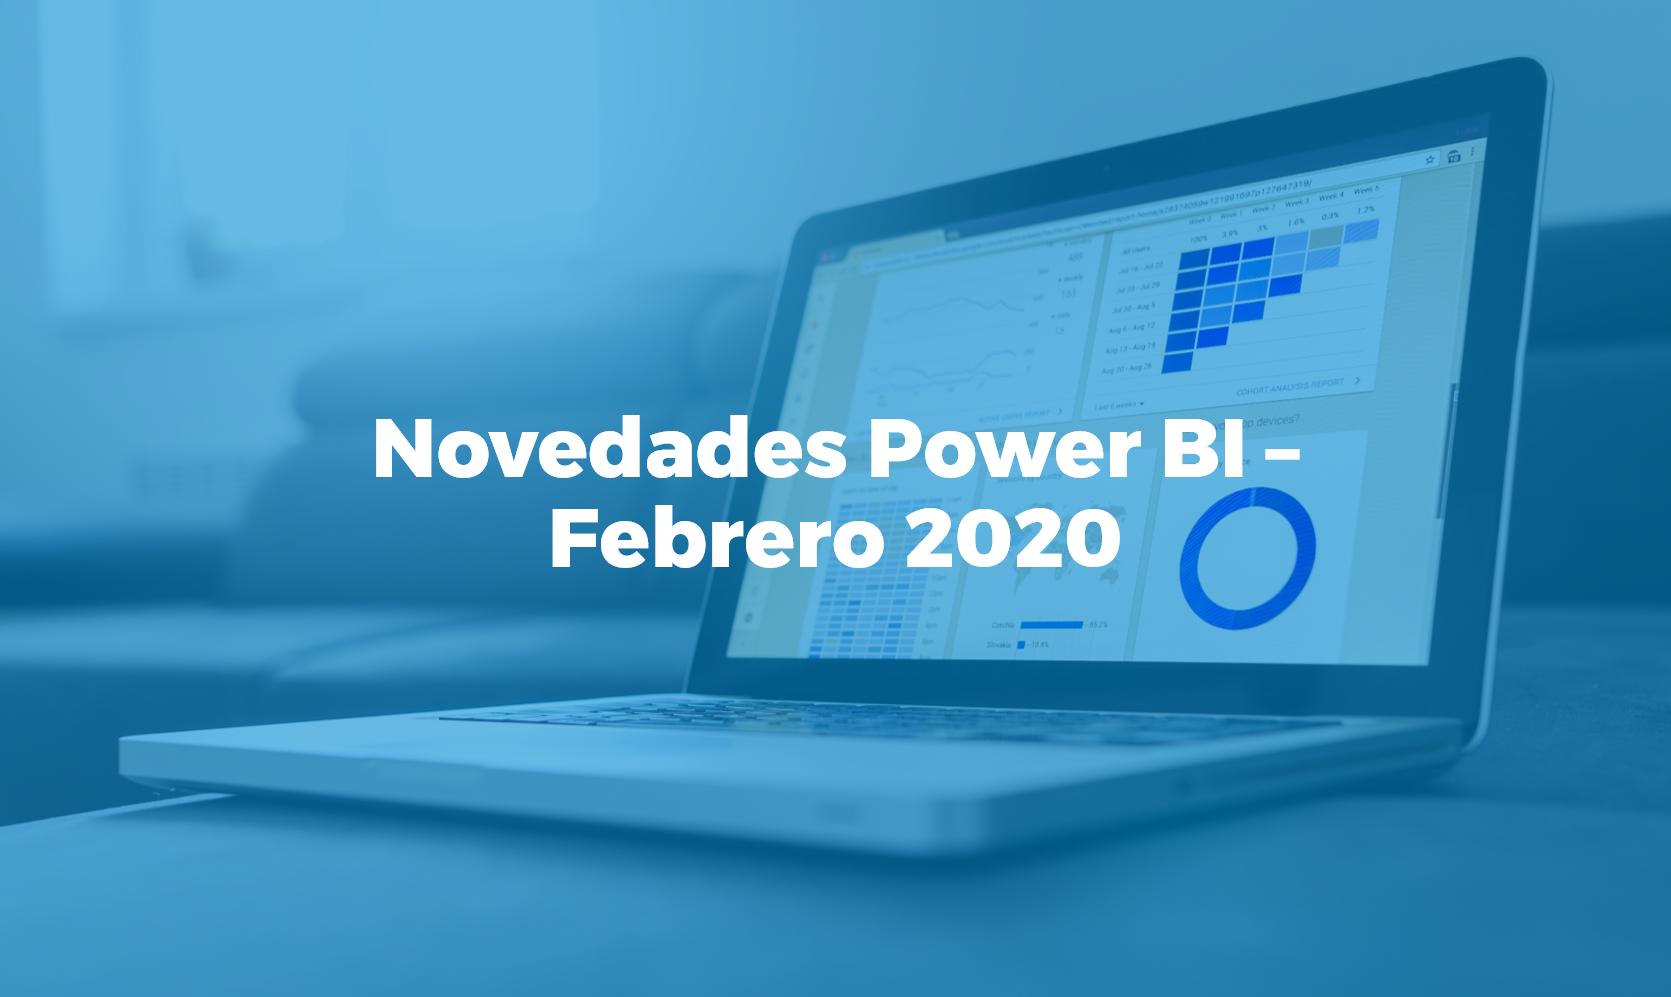 Novedades Power BI febrero 2020